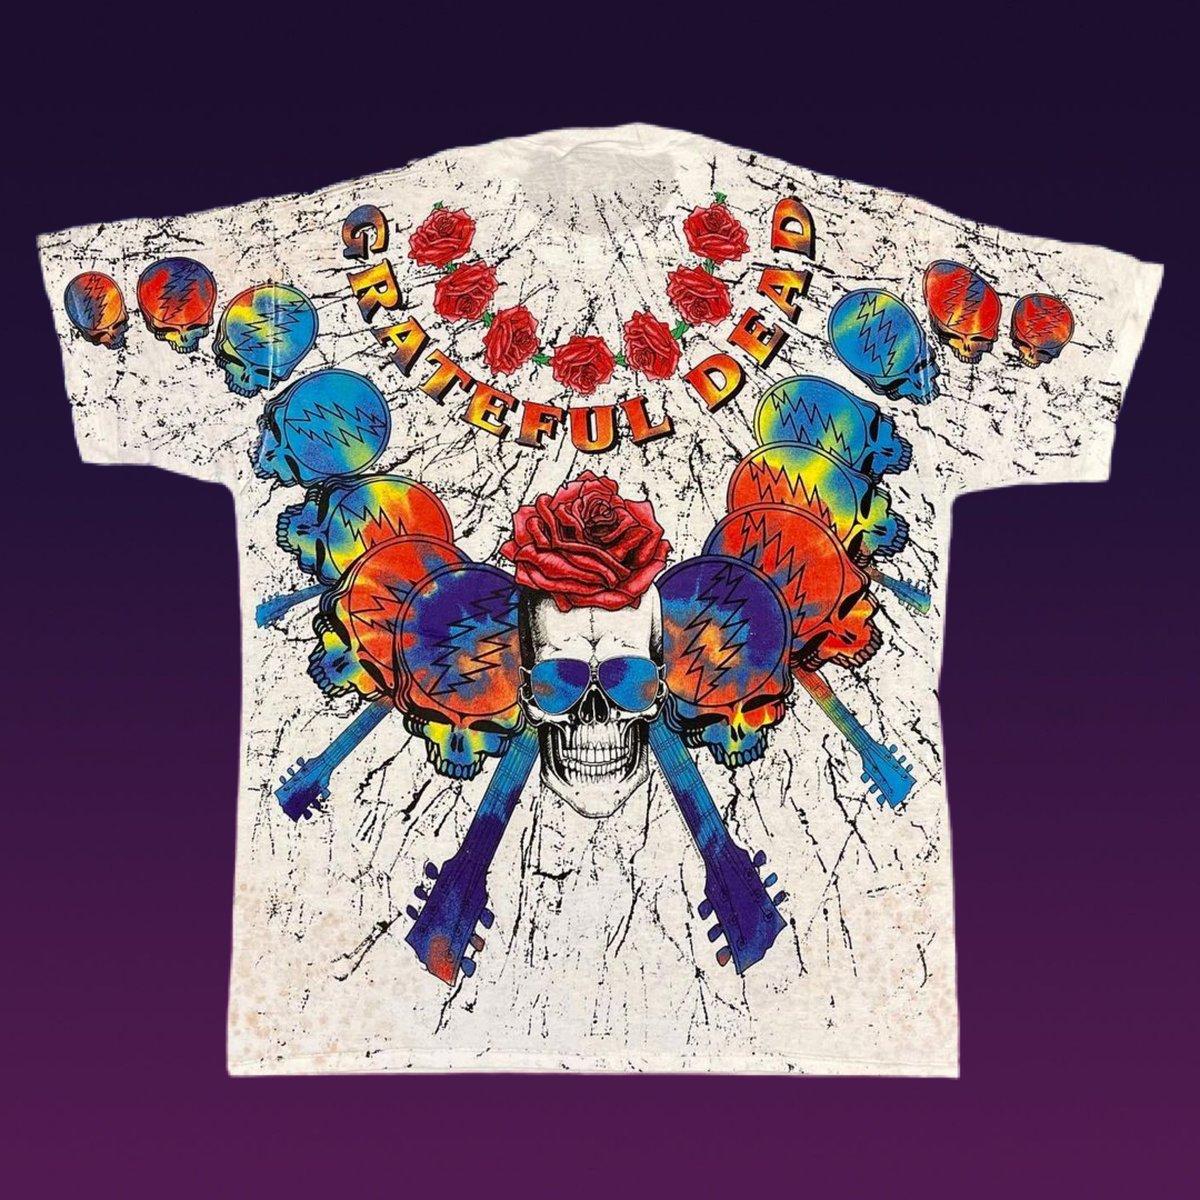 Original RARE Vintage Grateful Dead 1992 Roses & Guitar All Over Tee! X-Large